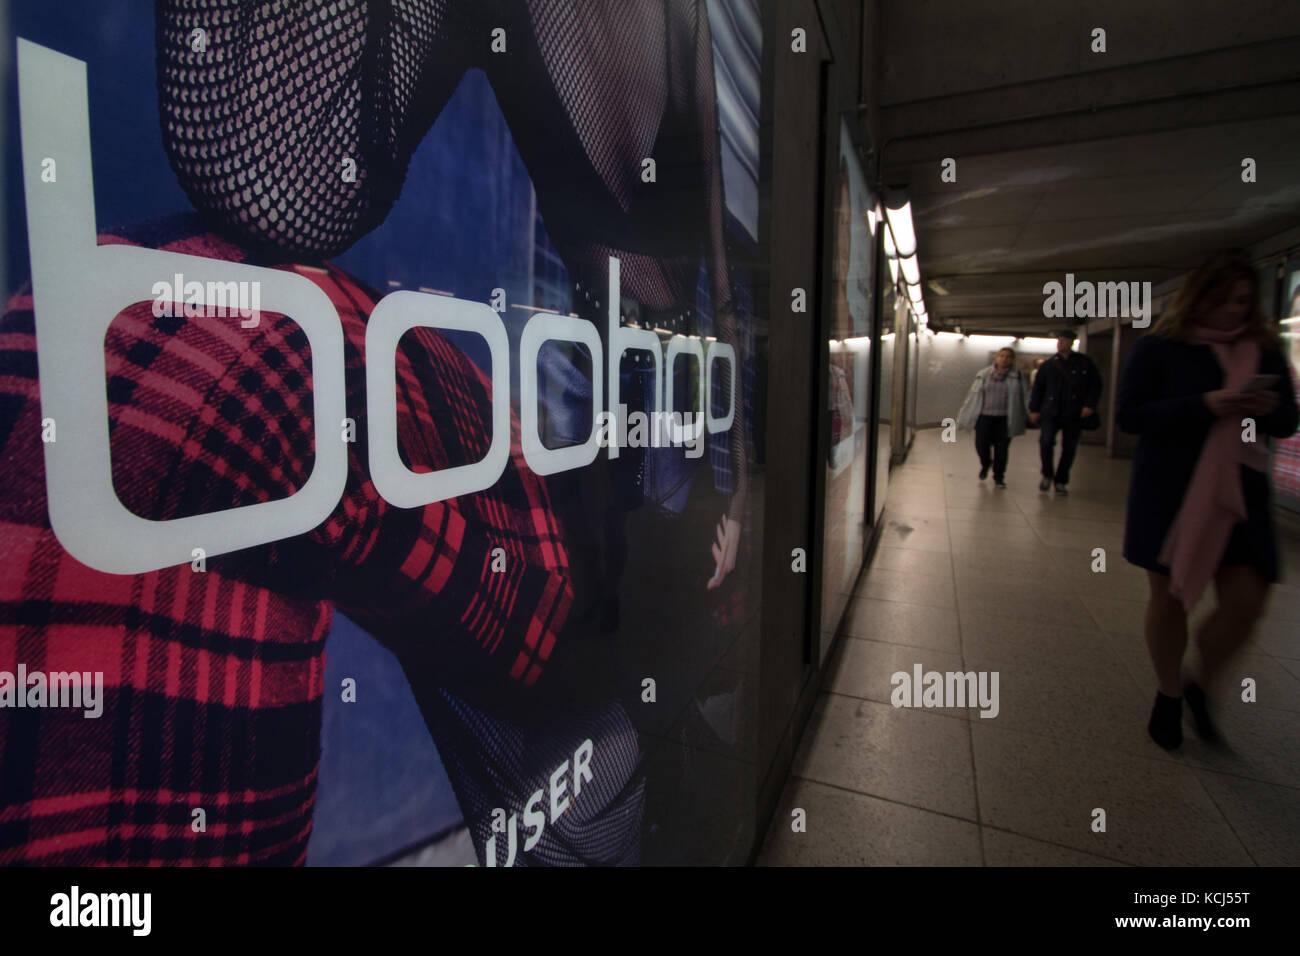 cc1eb7bf9a8 boohoo, boohoo.com fashion outlet advert on London station - Stock Image